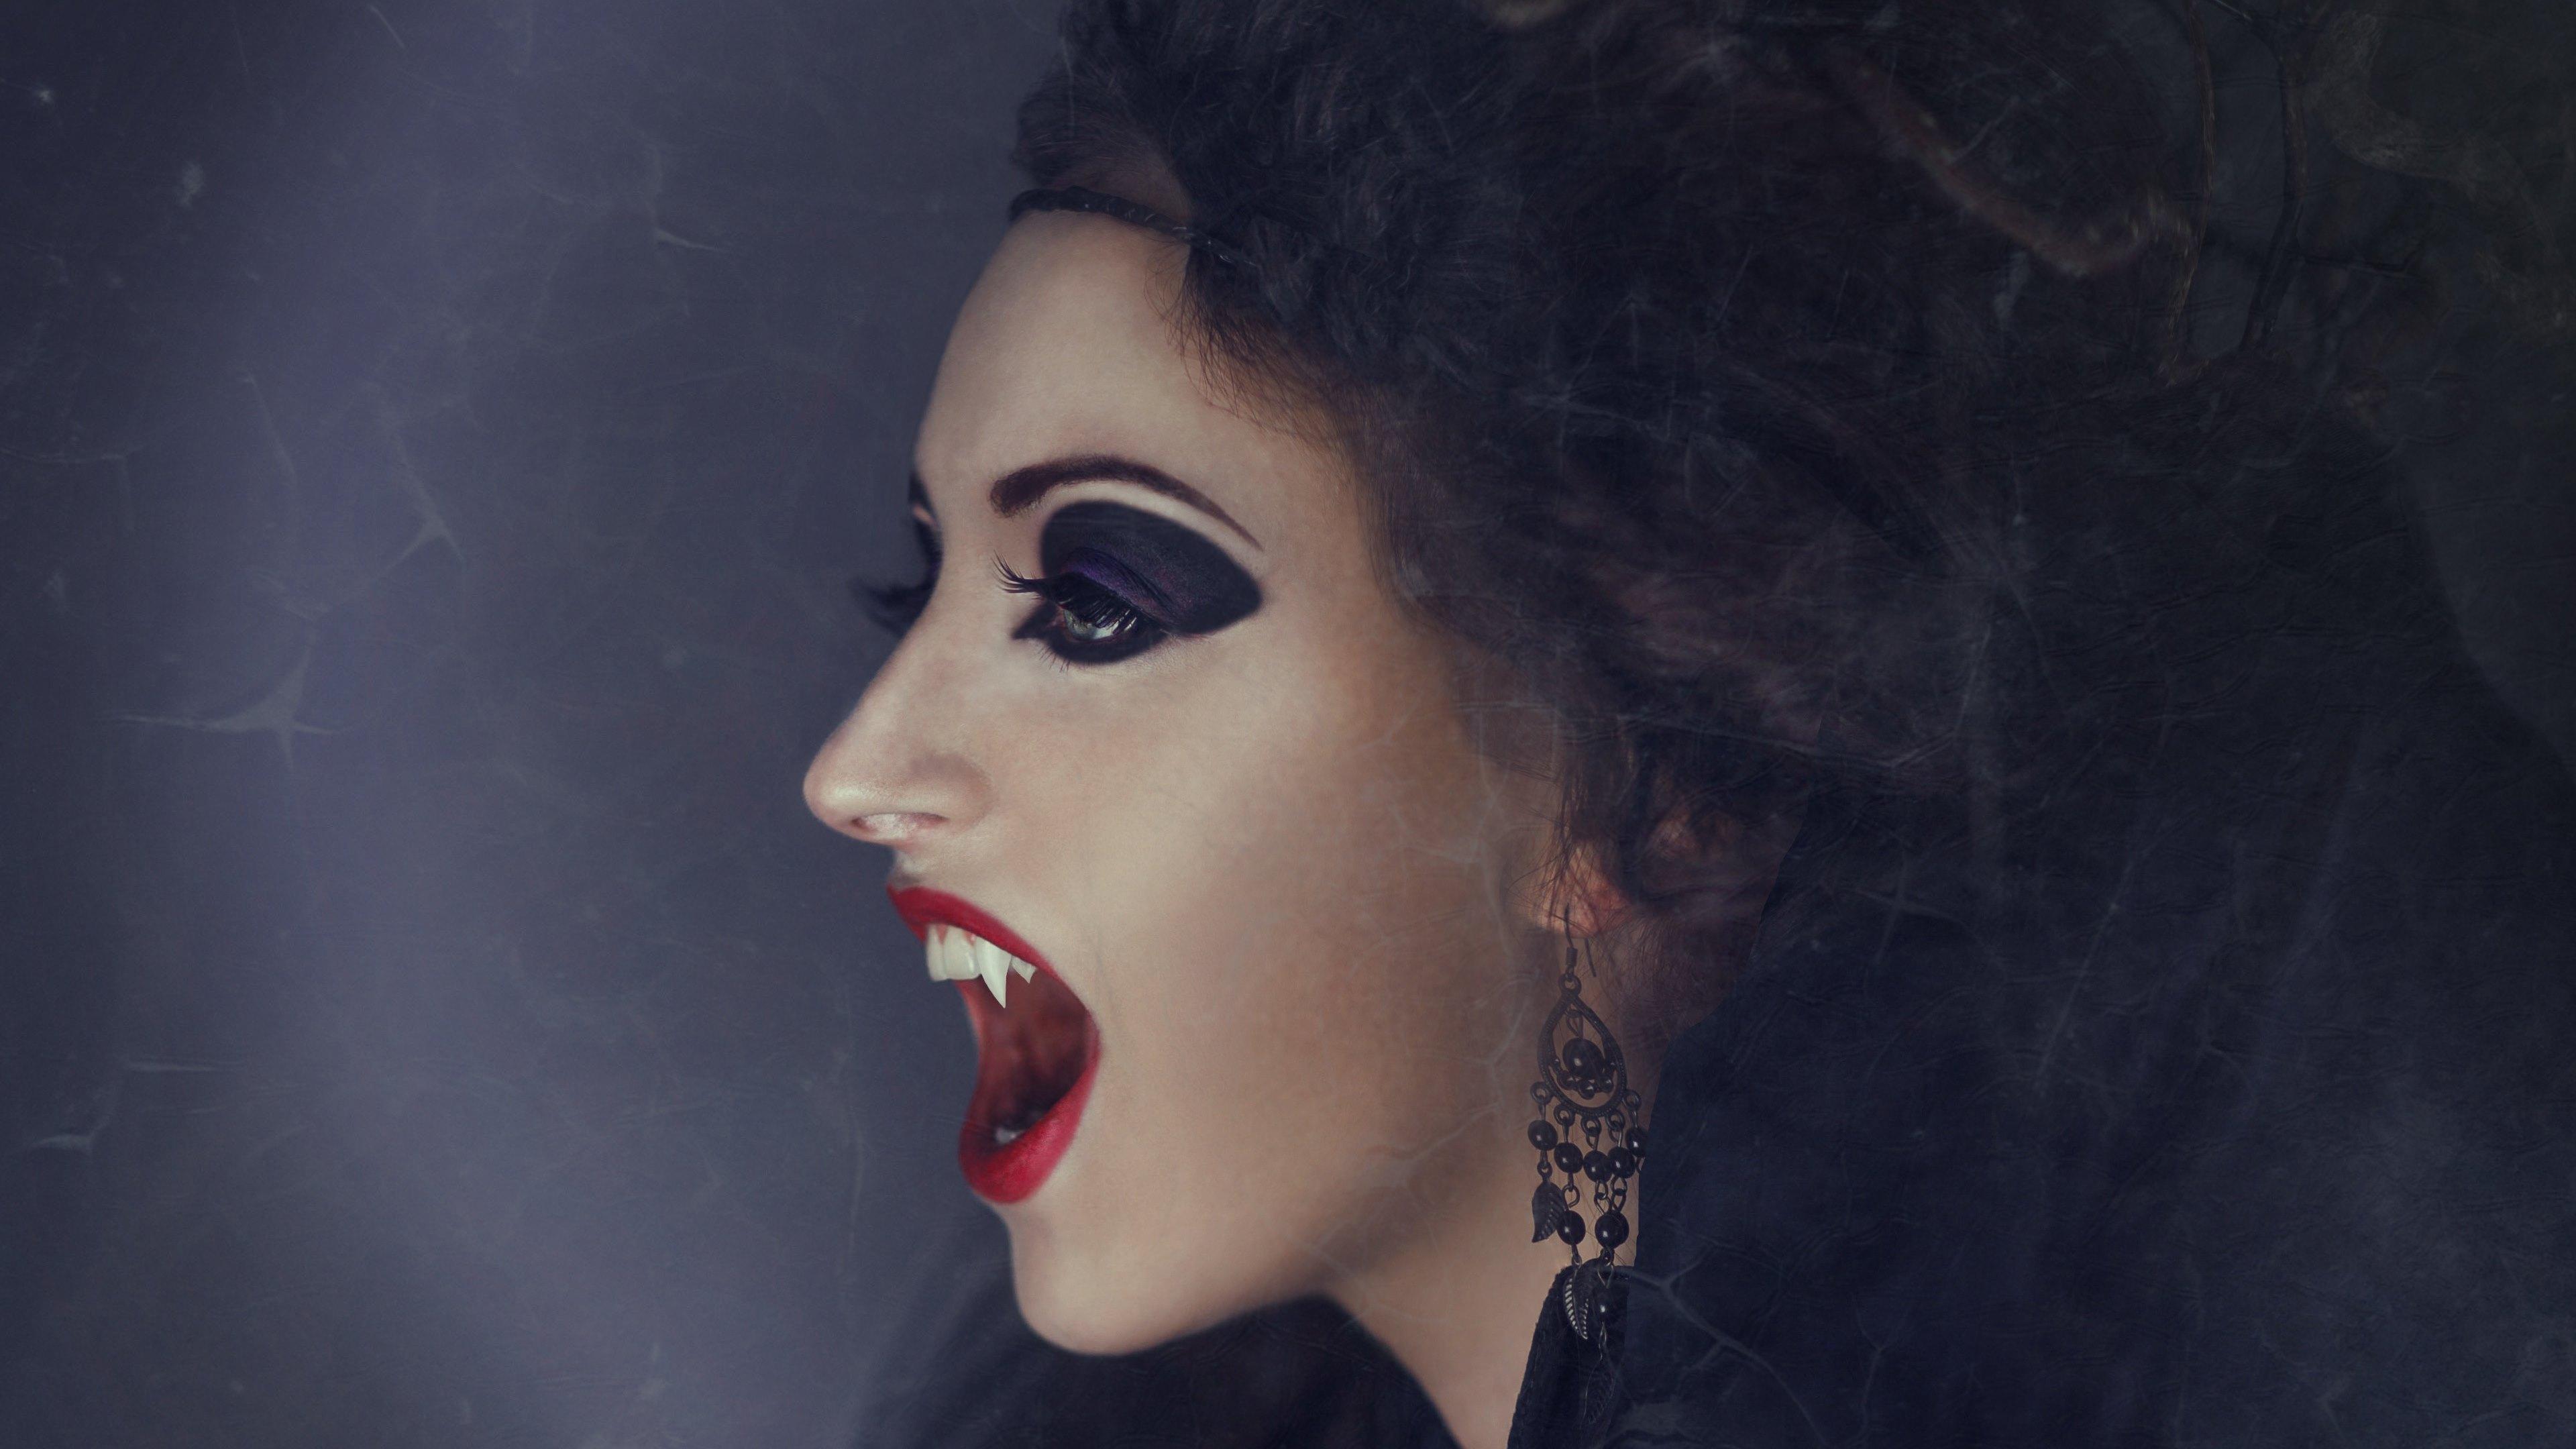 Vampire 4k Ultra HD Wallpaper | Background Image ...